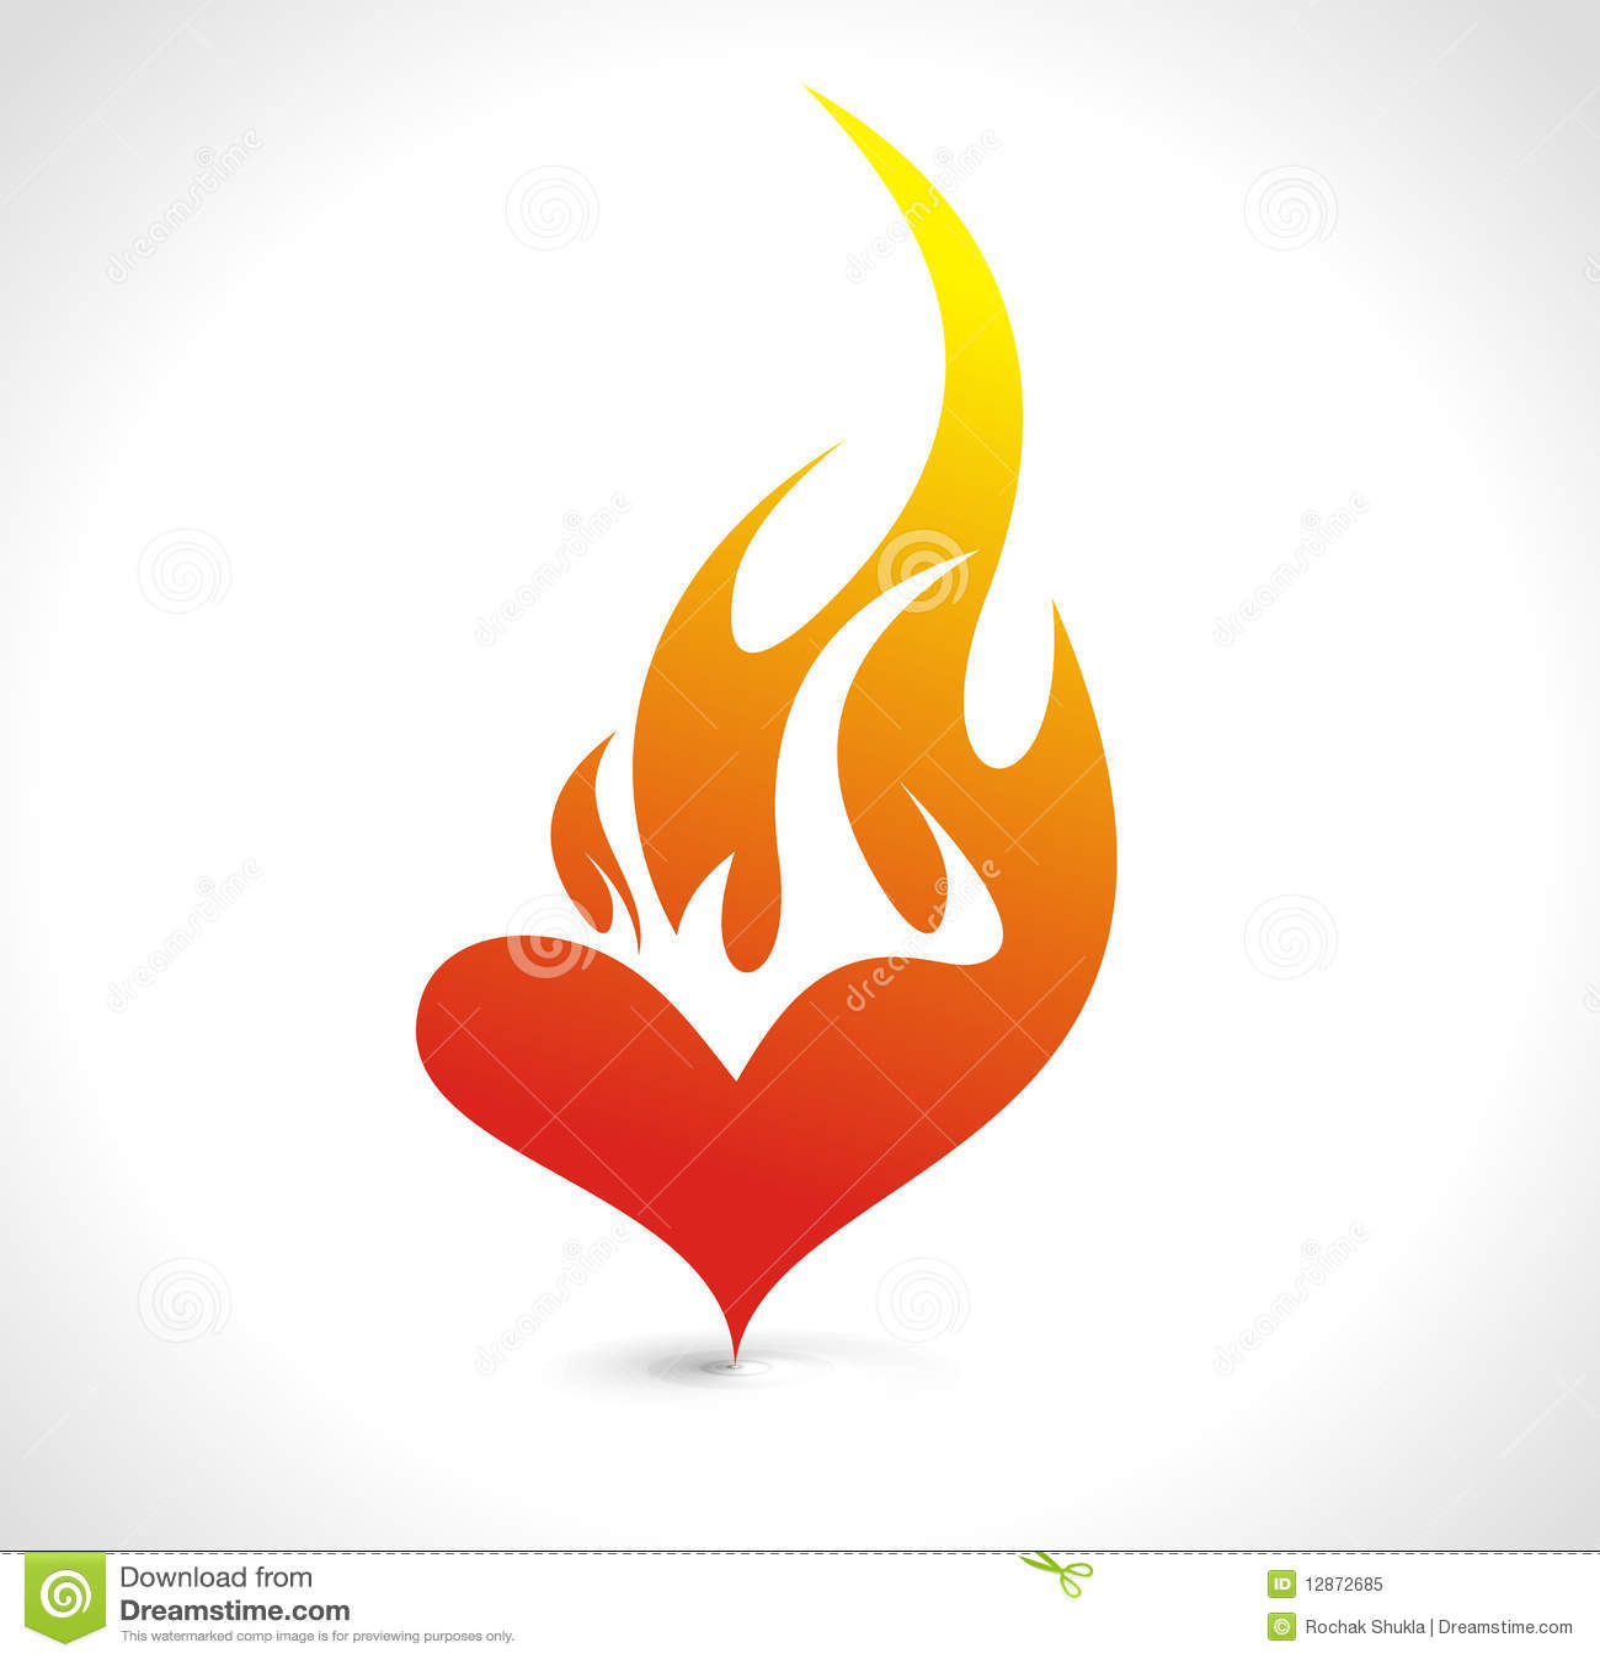 heart on fire tattoo